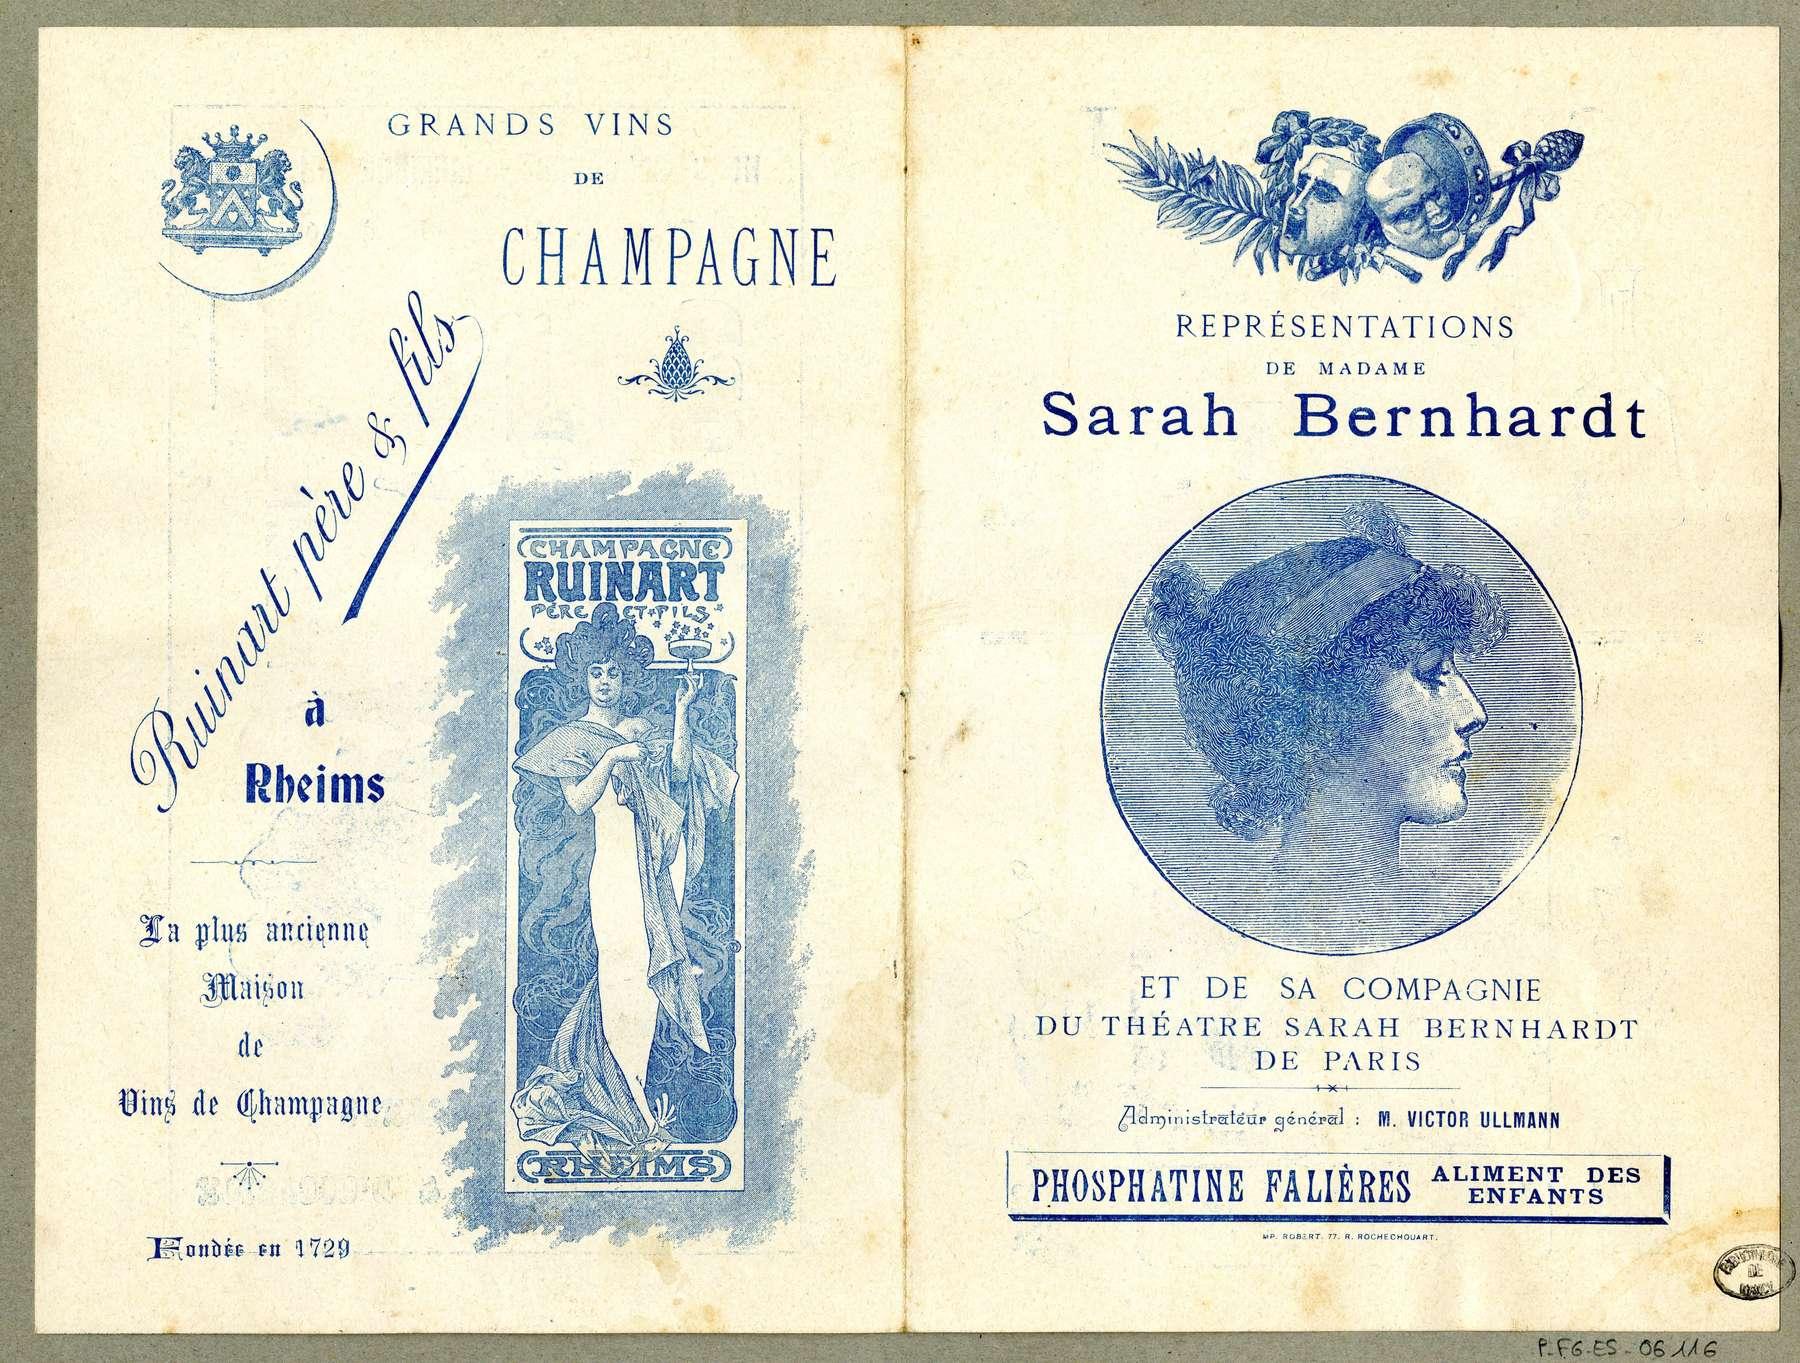 Contenu du Représentations de madame Sarah Bernhardt